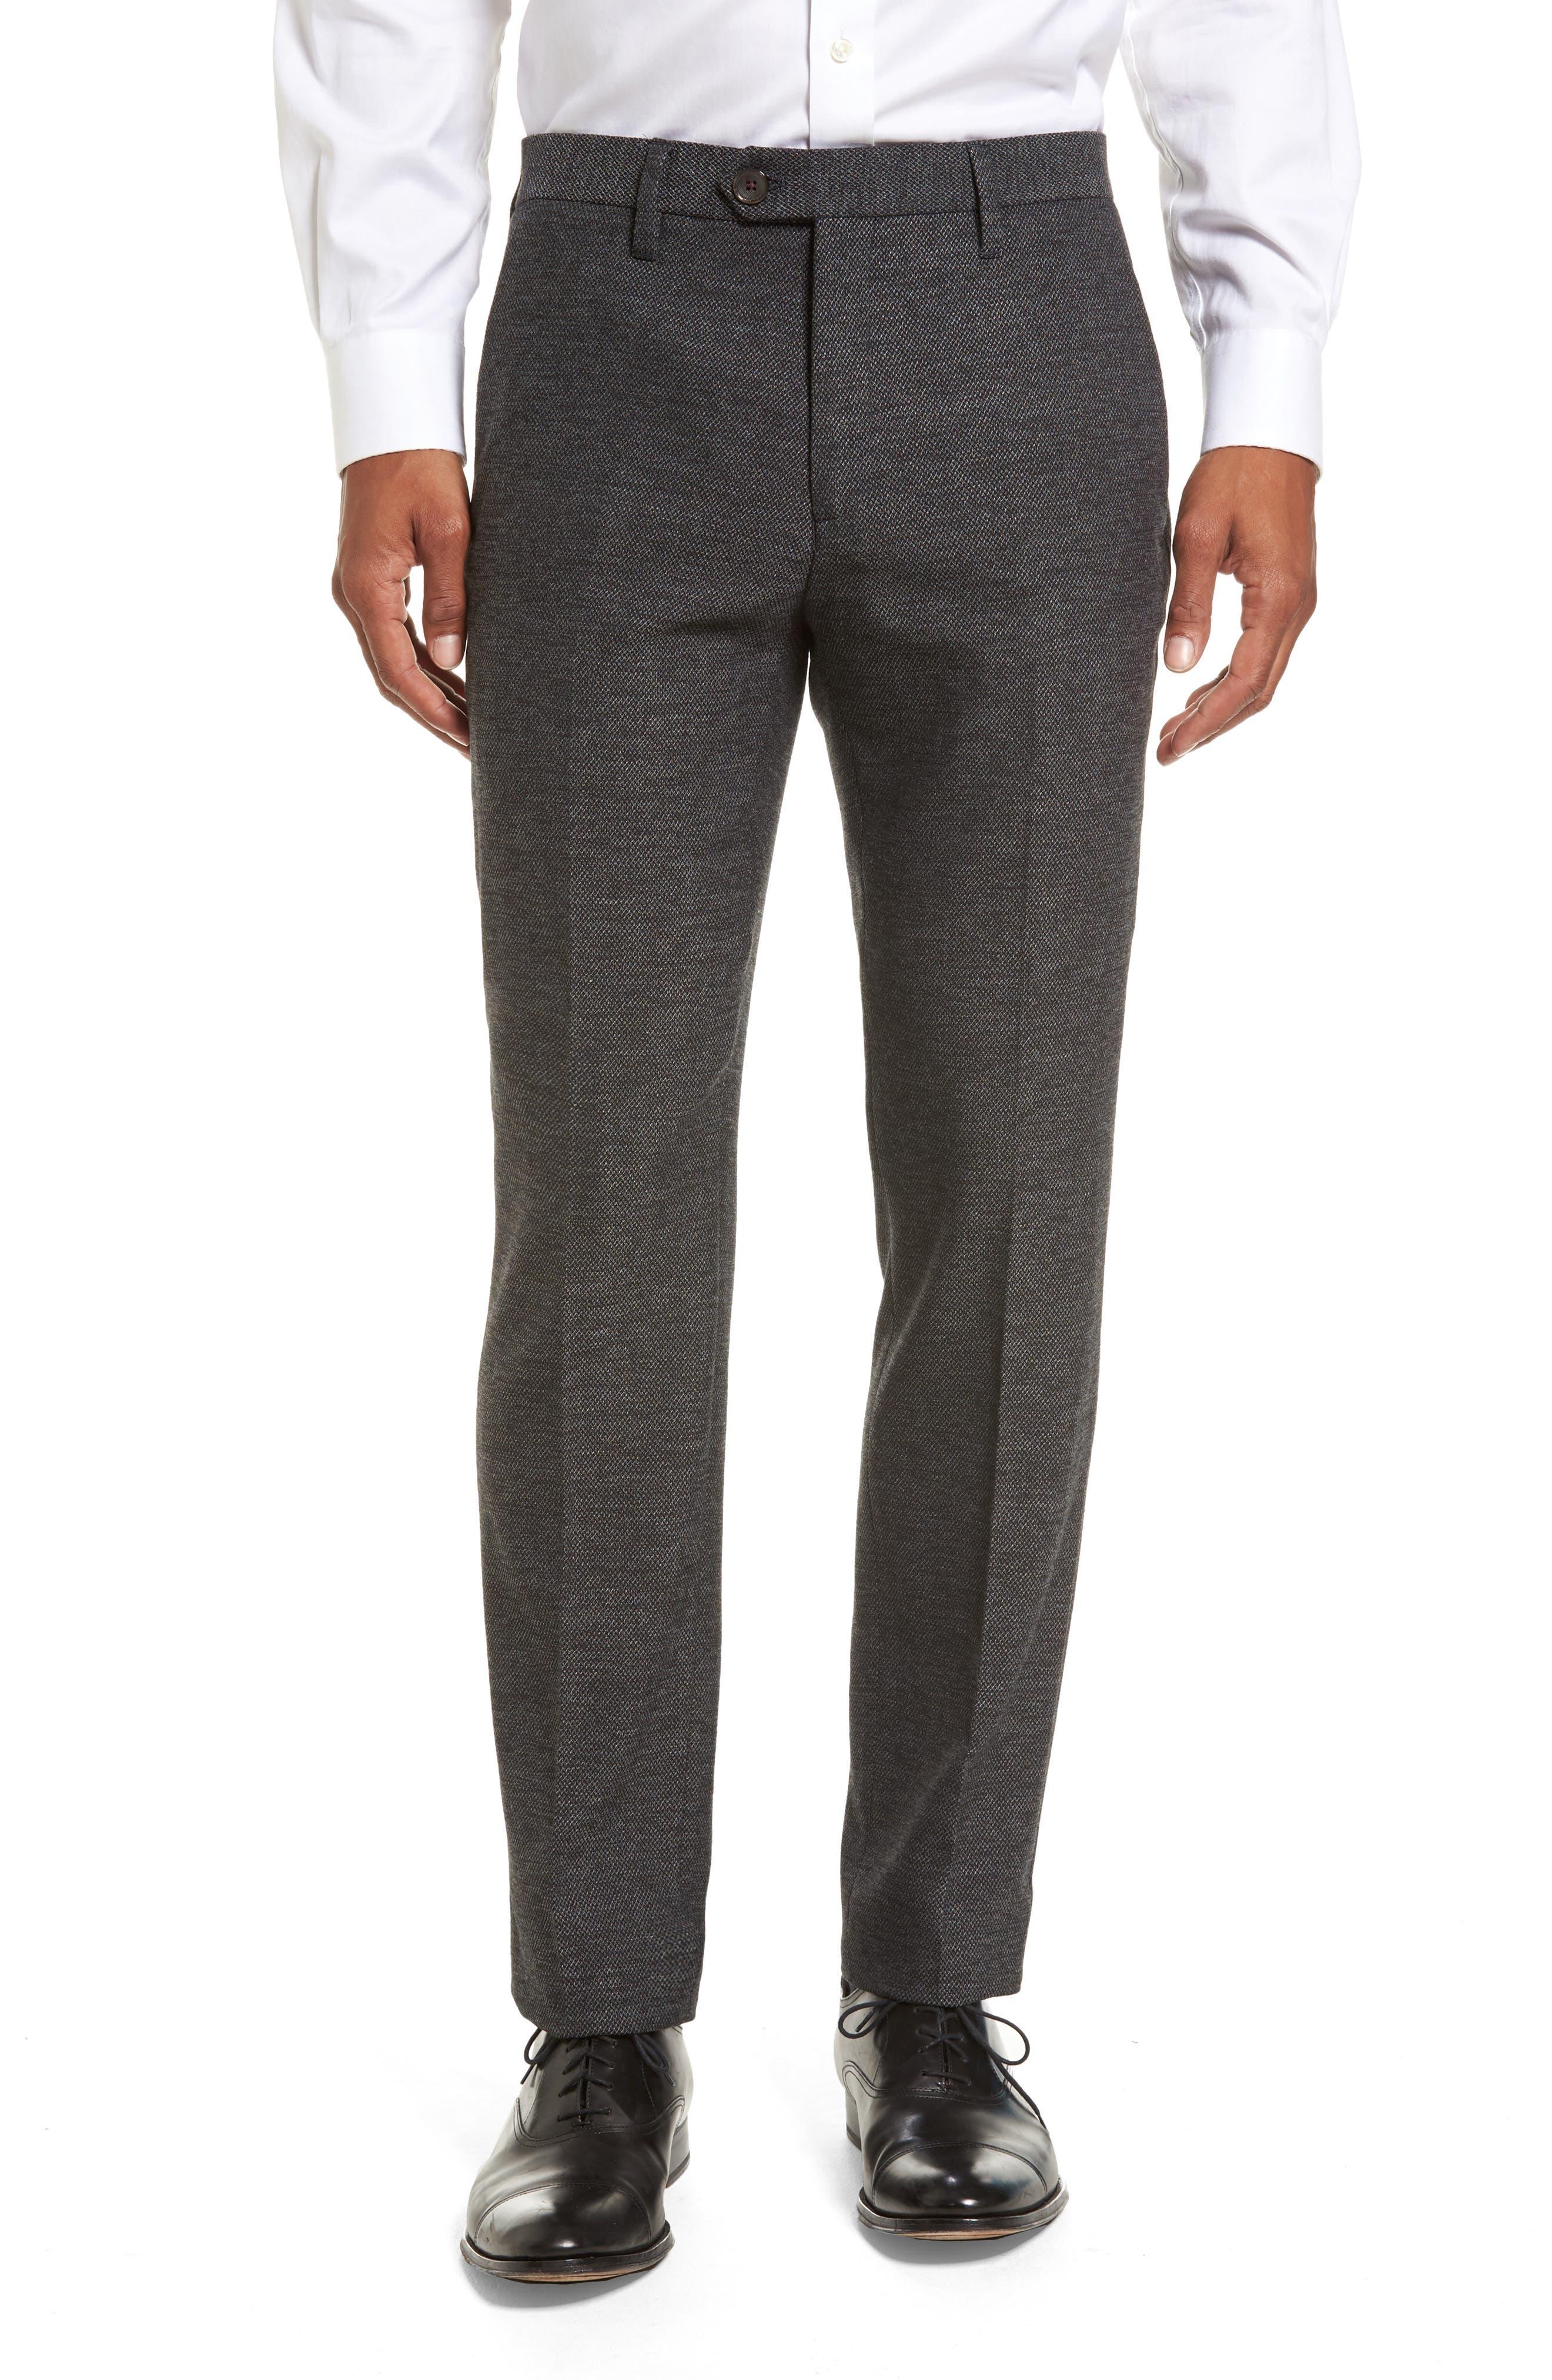 Porttro Modern Slim Fit Trousers,                             Main thumbnail 1, color,                             010